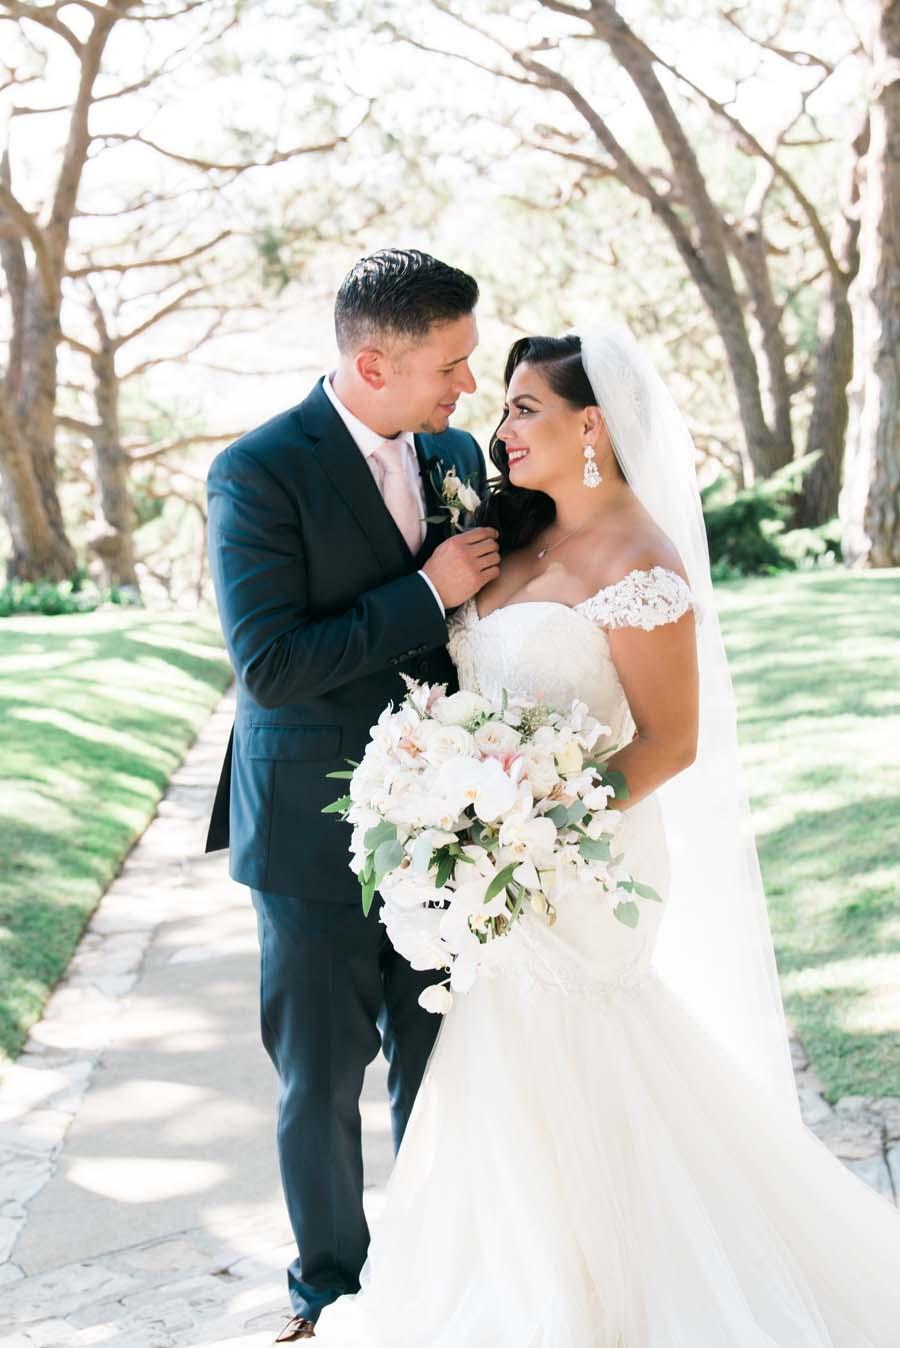 carissawoophotography.com | Carissa Woo Photography | Wayfarers Chapel Southern California Wedding Photographer | Los Angeles Weddings Photography  (8).jpg